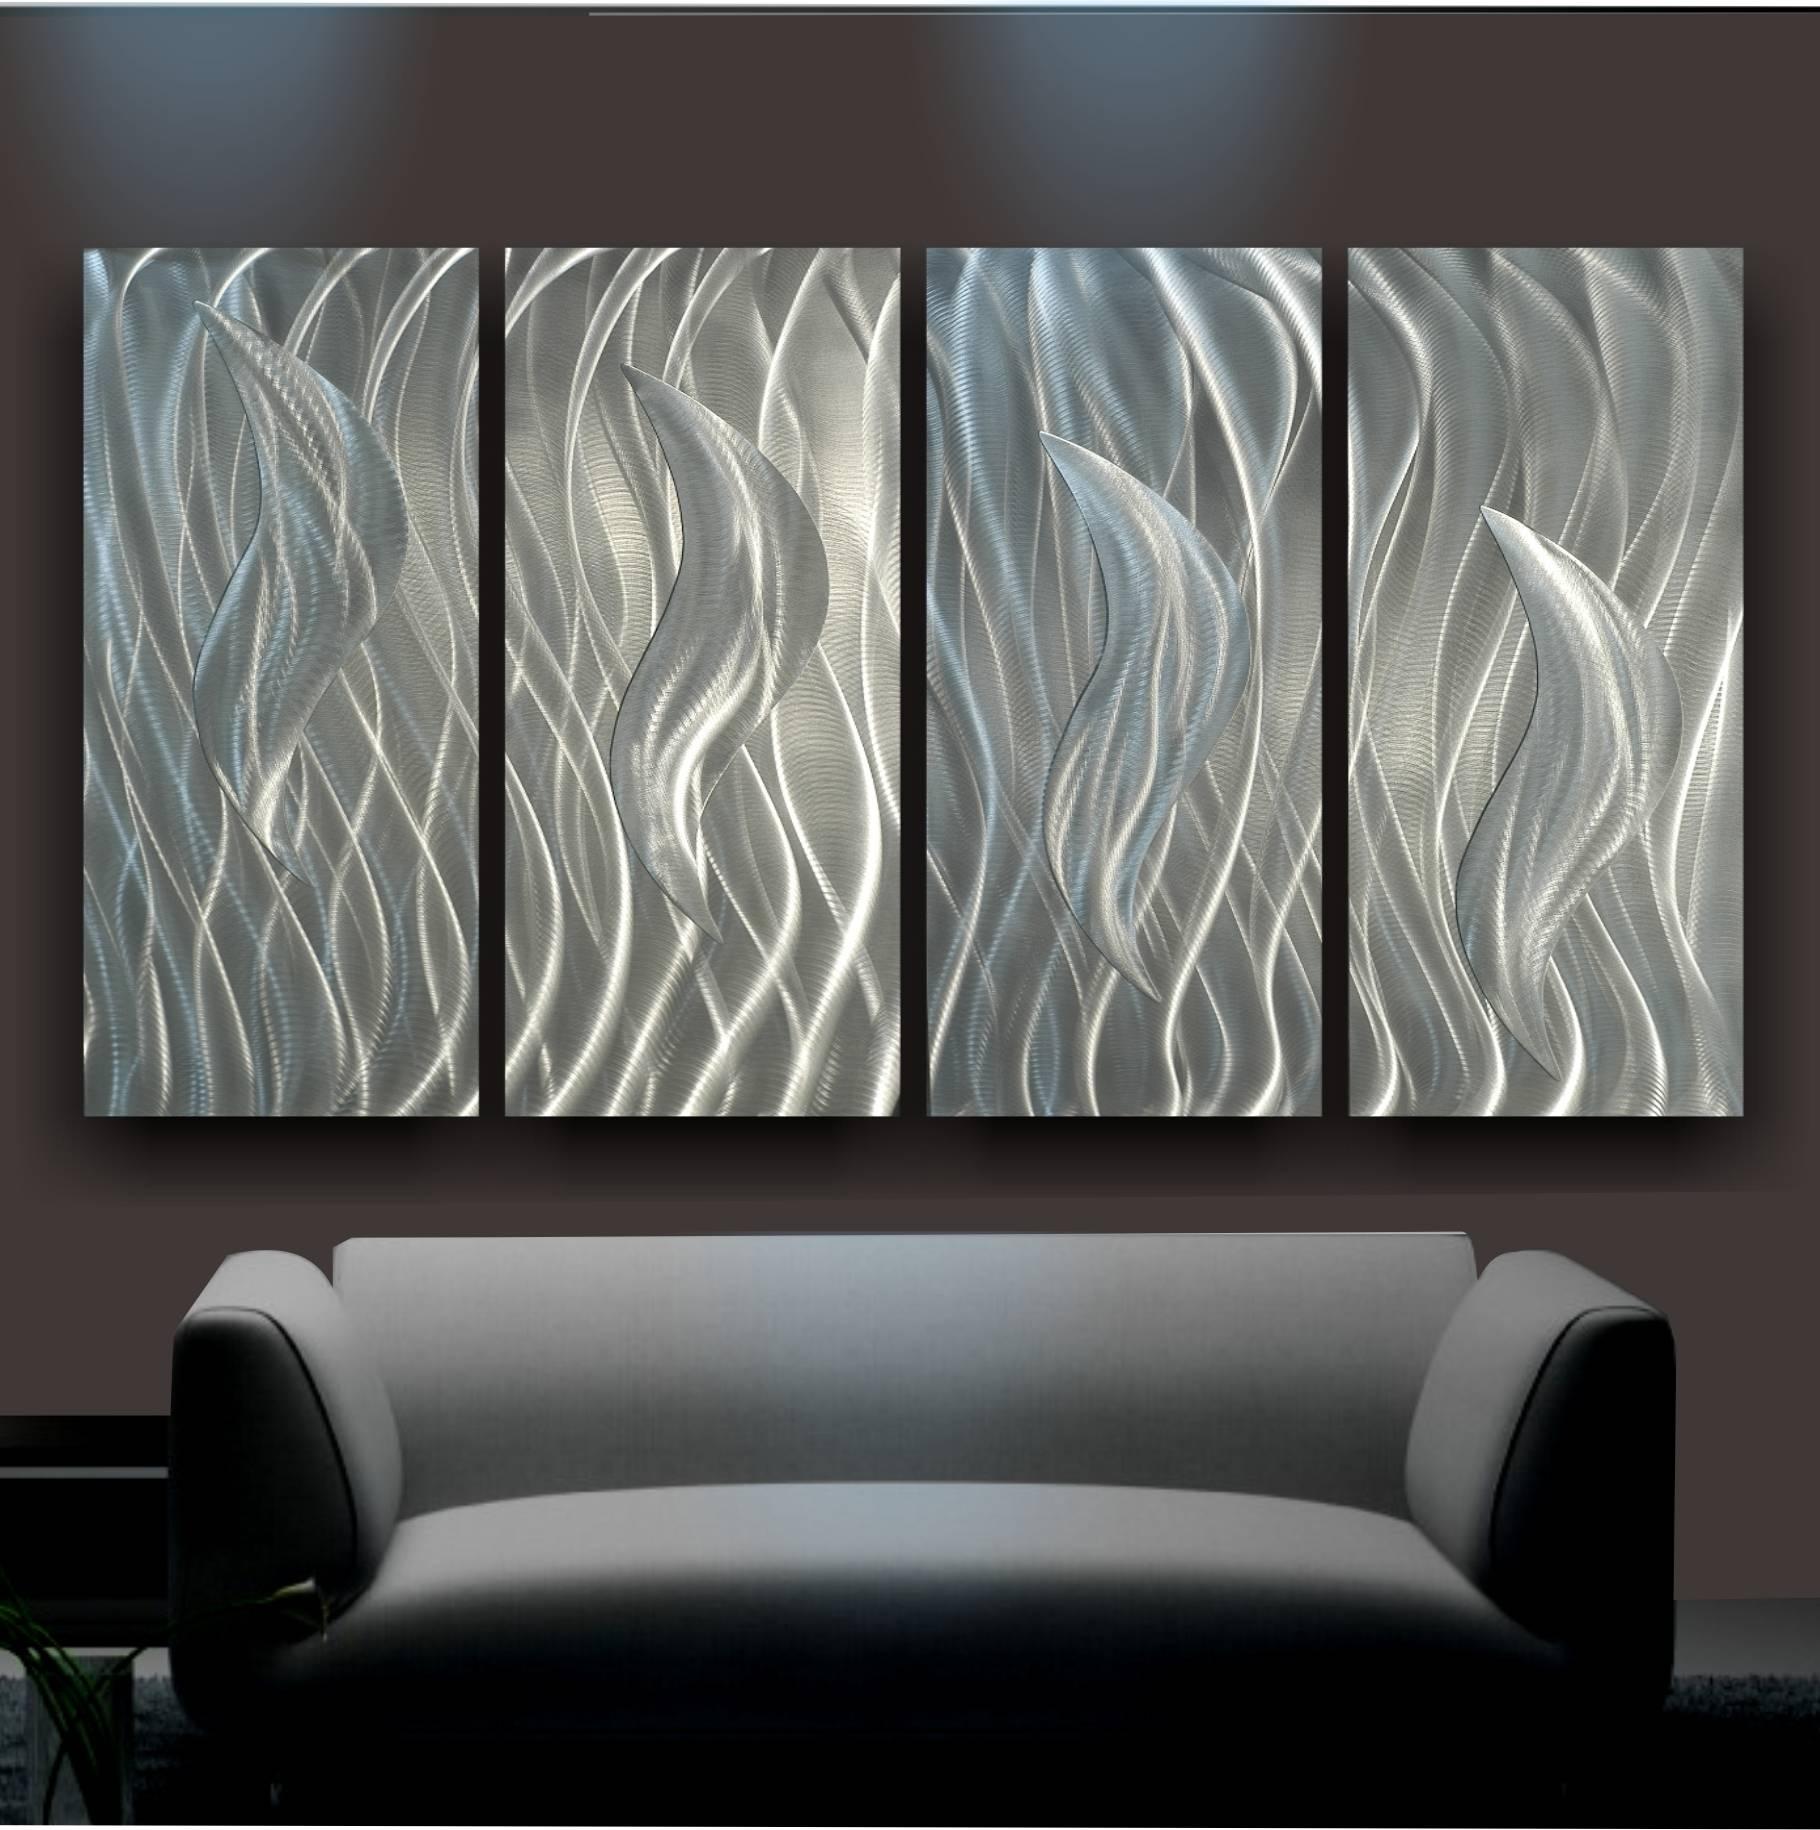 Metal Wall Designs Cheap Metal Wall Designs | Home Design Ideas In 2017 Cheap Metal Wall Art (View 15 of 20)